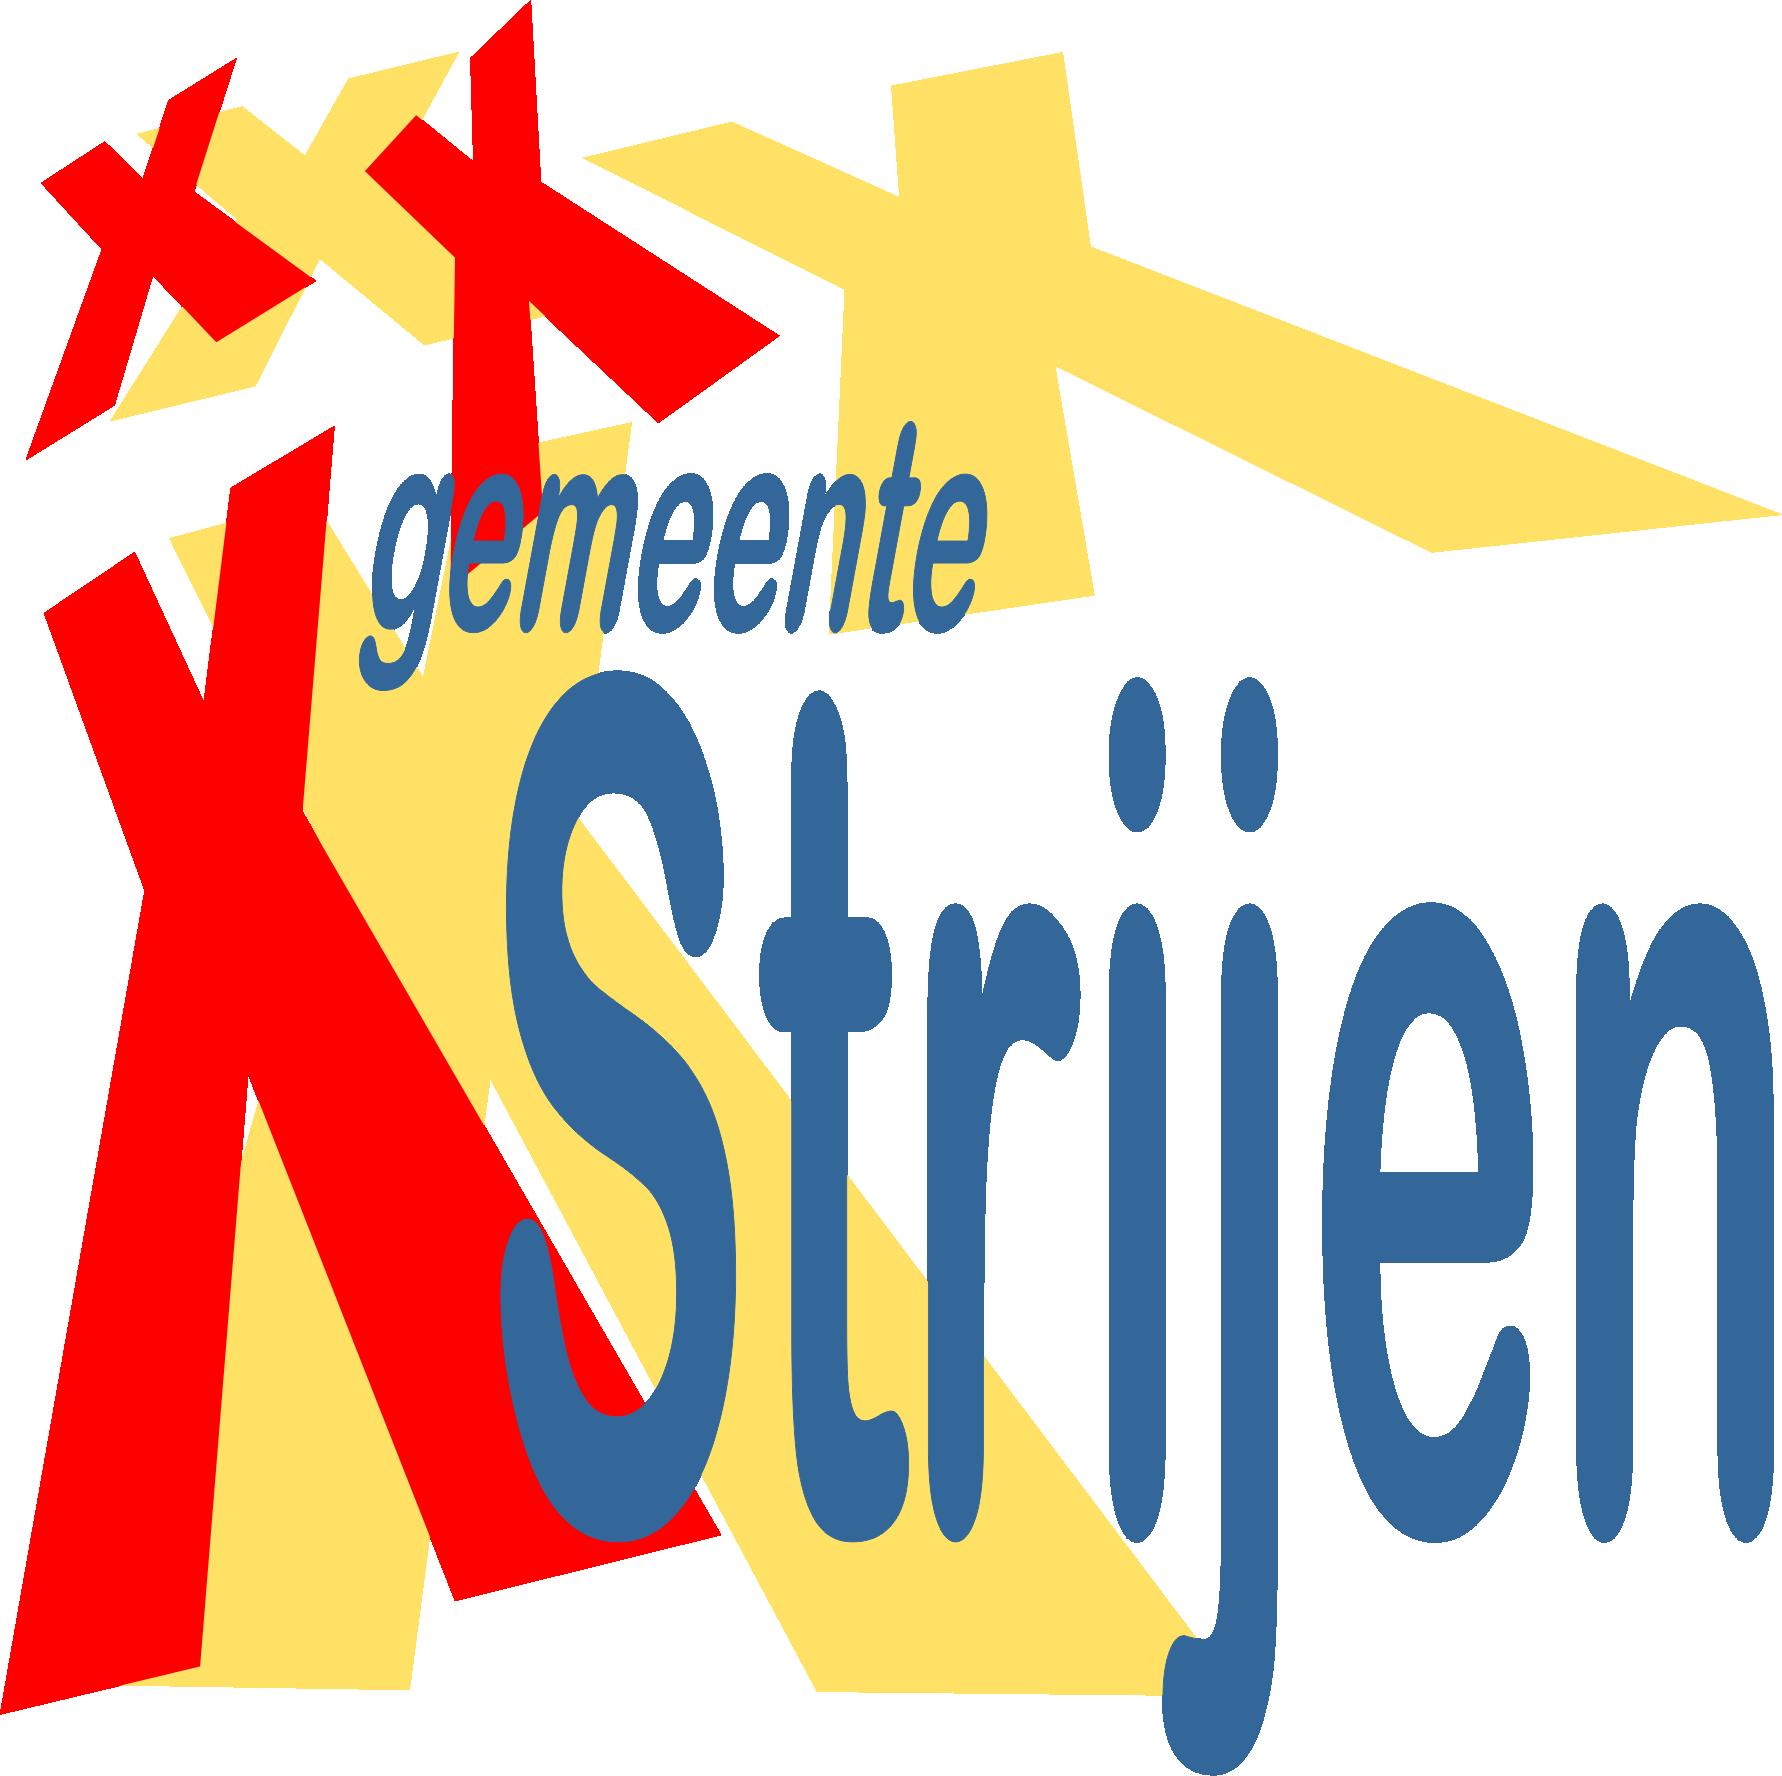 Nw logo 2015 vierkant